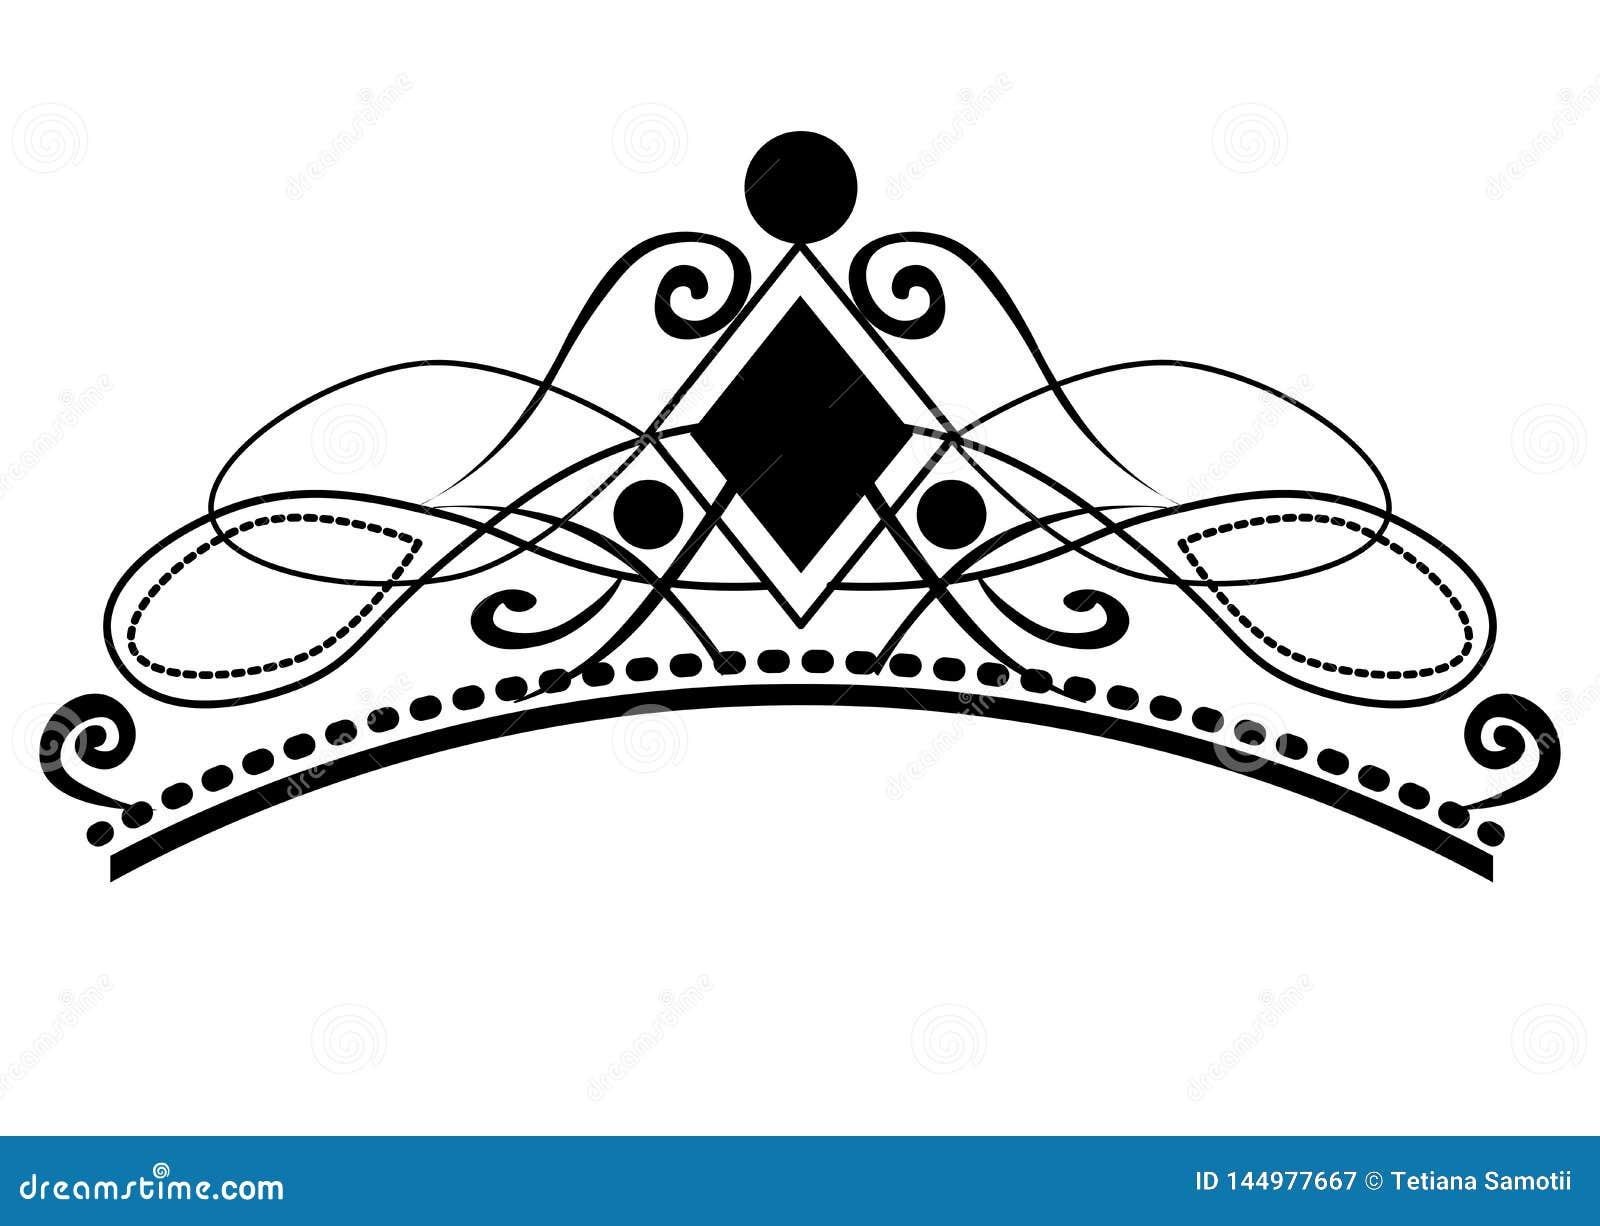 Web. Vintage calligraphic vignettes, elegant diadems and decorative design elements in retro style, vector